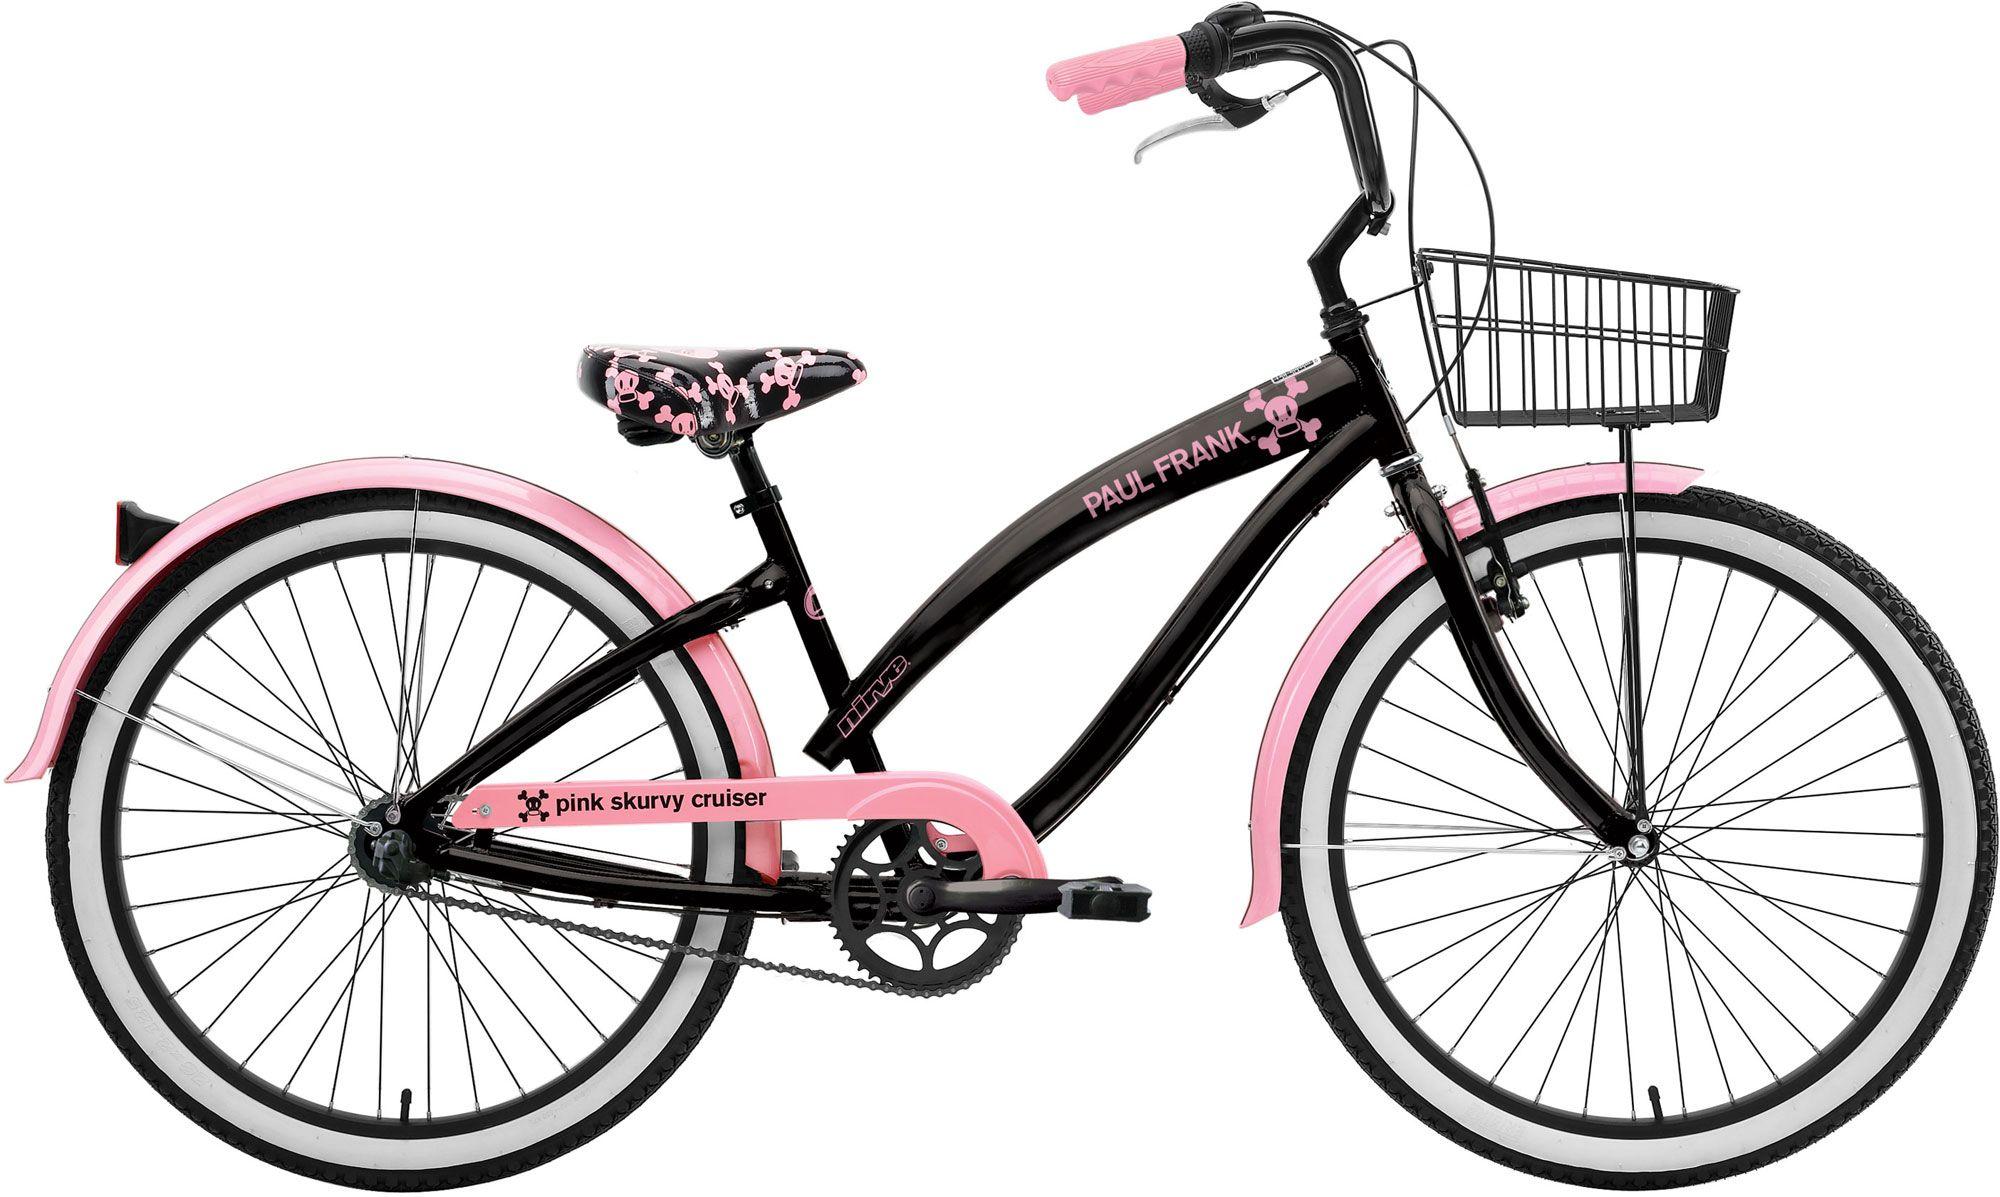 Nirve Paul Frank Skurvy 3 Speed Beach Cruiser Bicycle Beach Cruiser Bikes Cruiser Bicycle